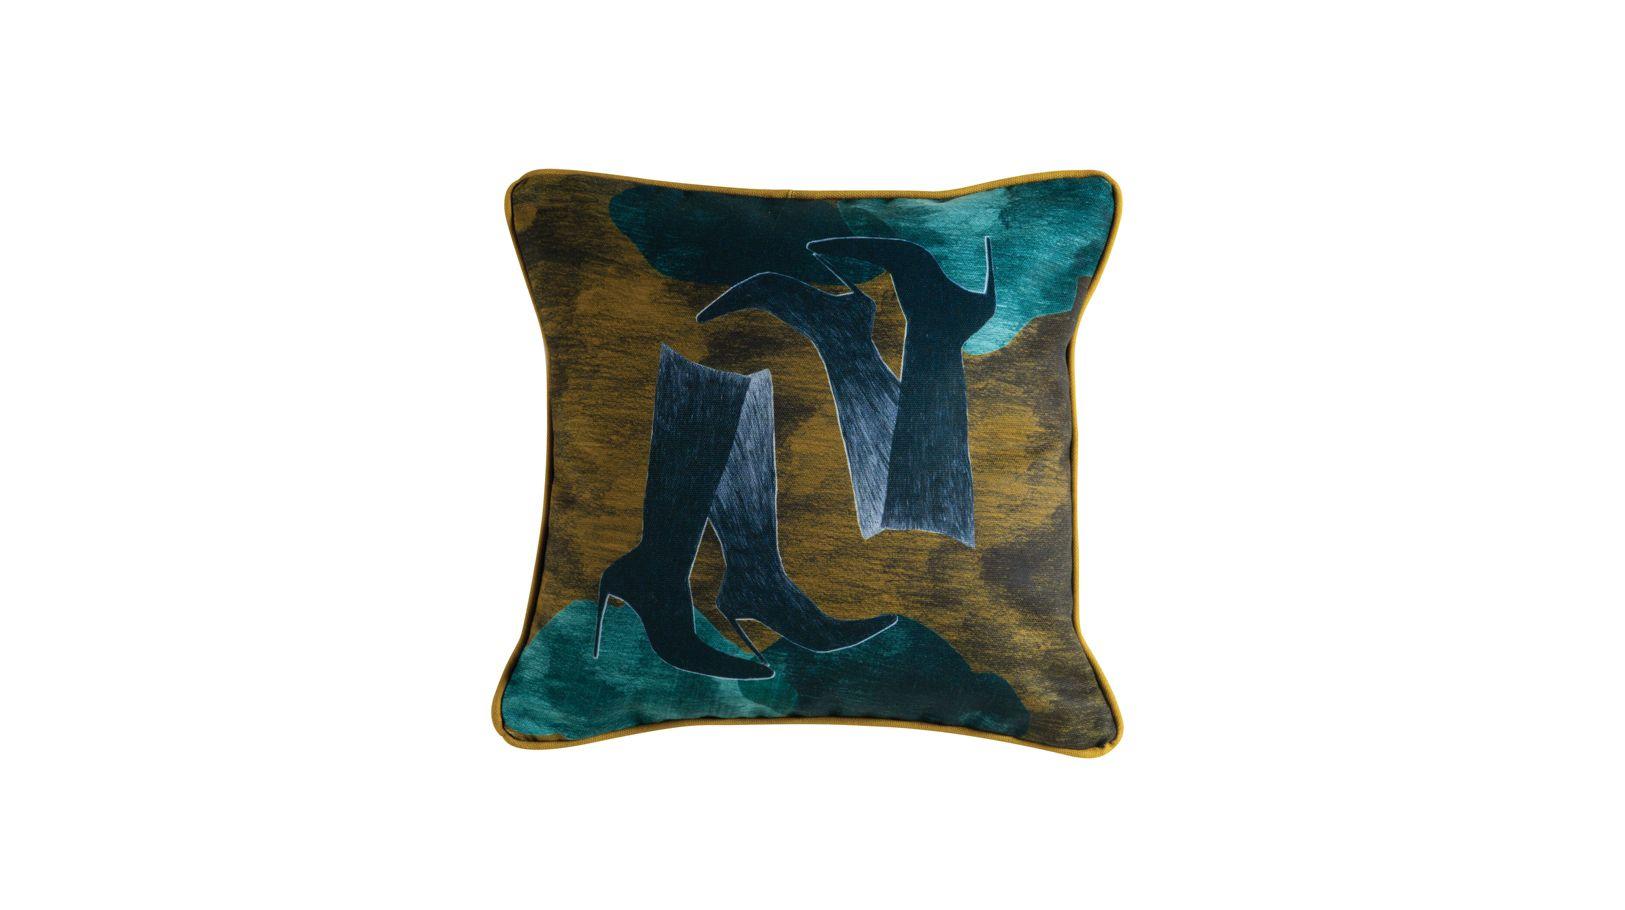 bottes cushion roche bobois. Black Bedroom Furniture Sets. Home Design Ideas